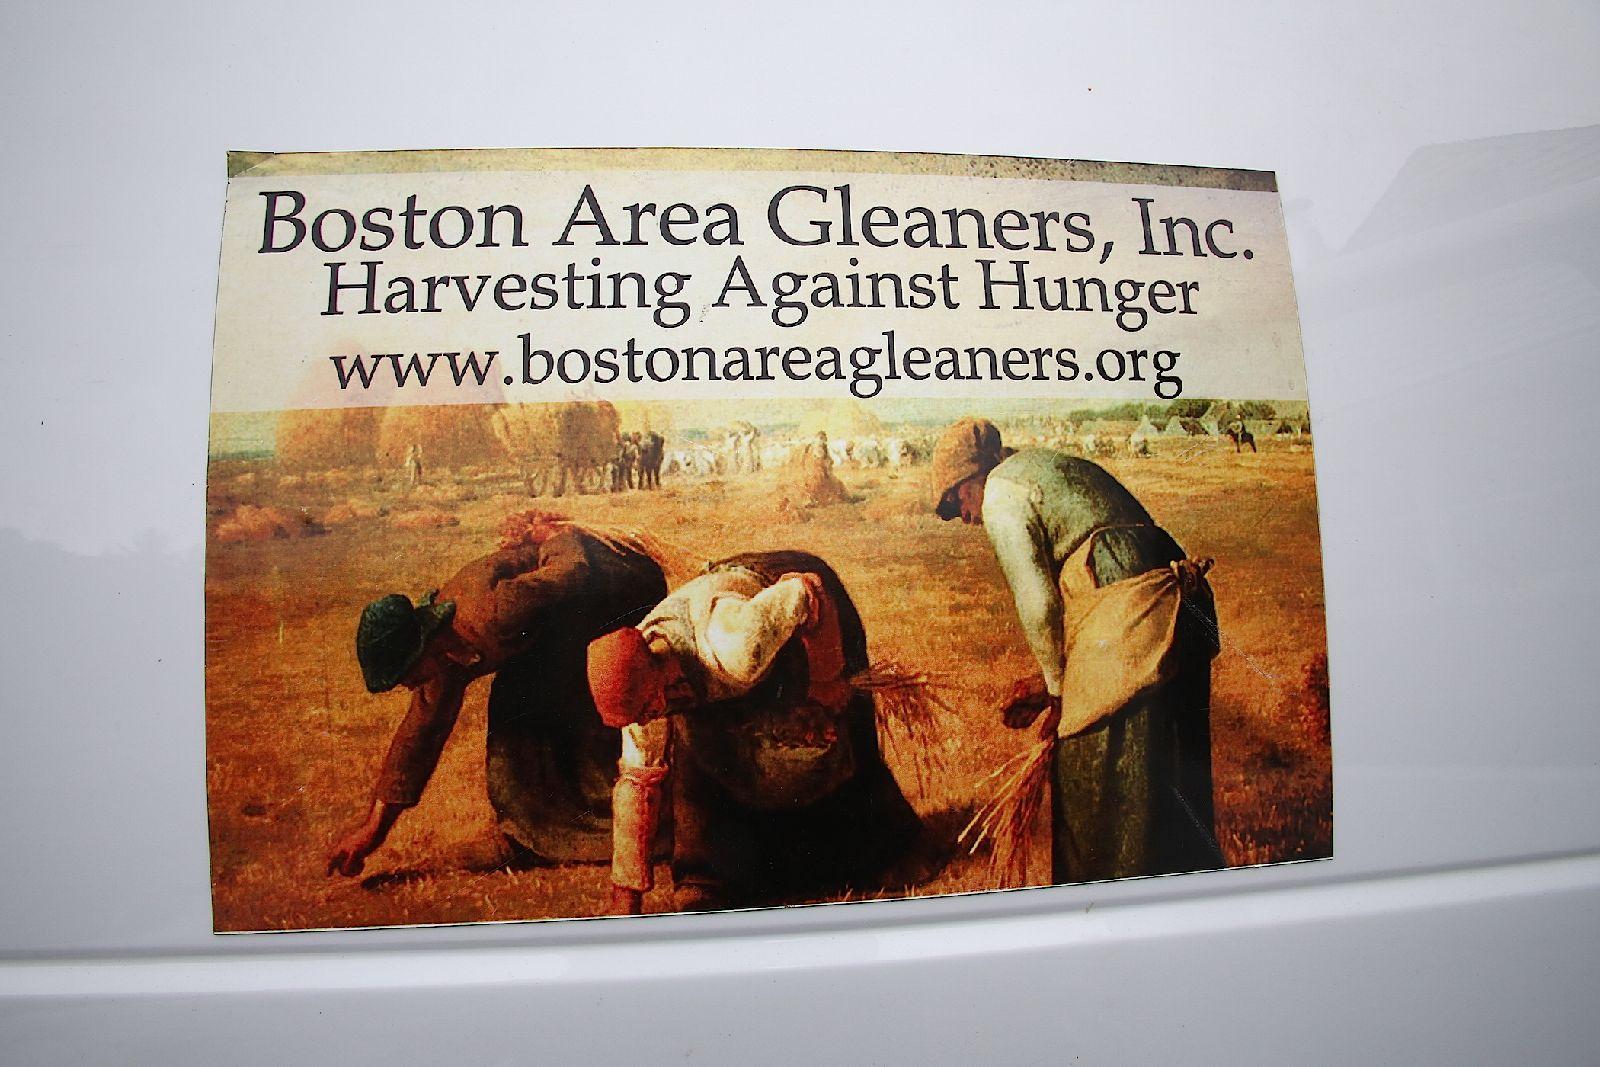 Gleaners_poster_7_16.JPG